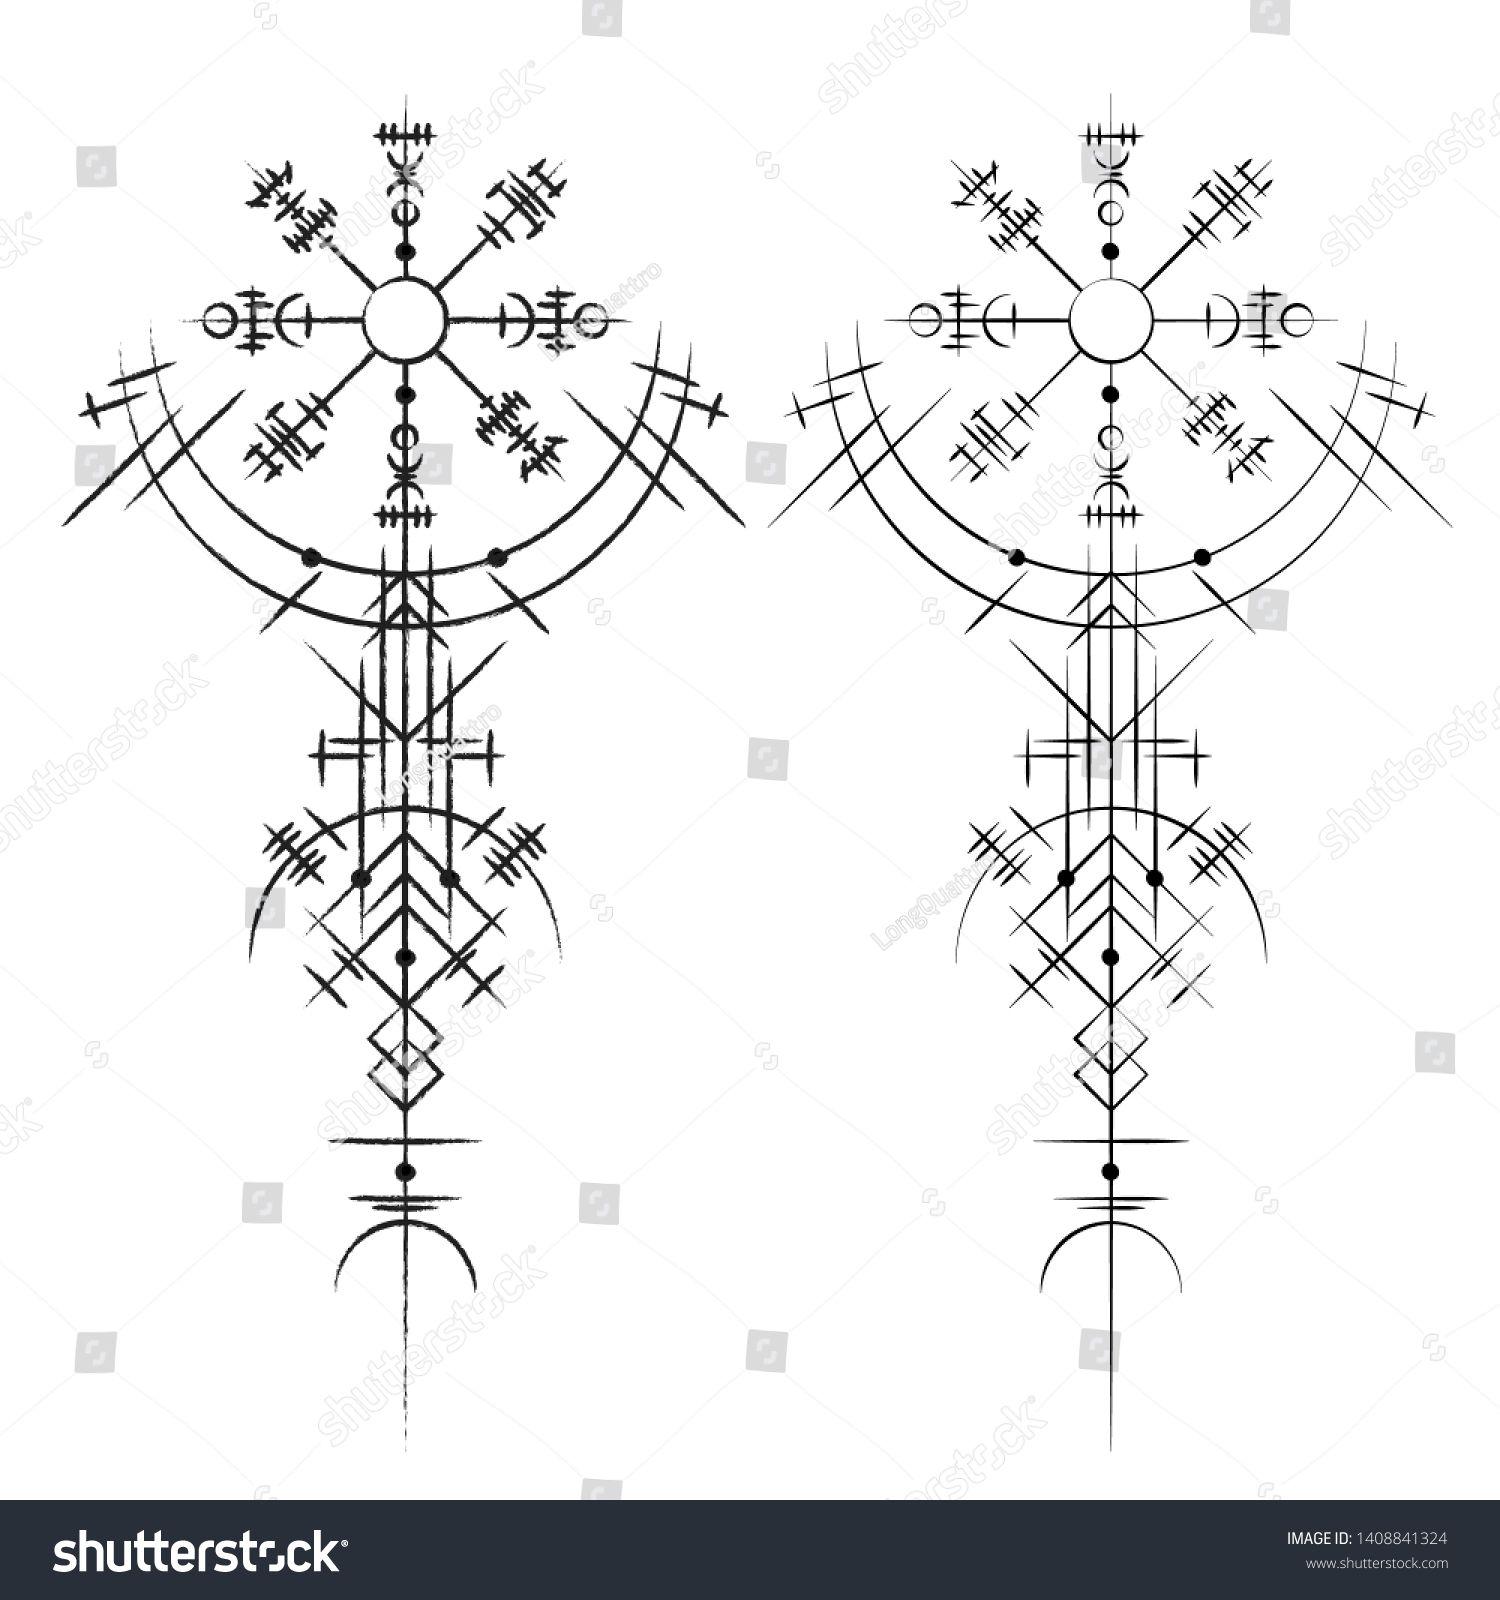 Black Abstract Viking Magic Symbols Isolated Stock Vector (Royalty Free) 1408841324